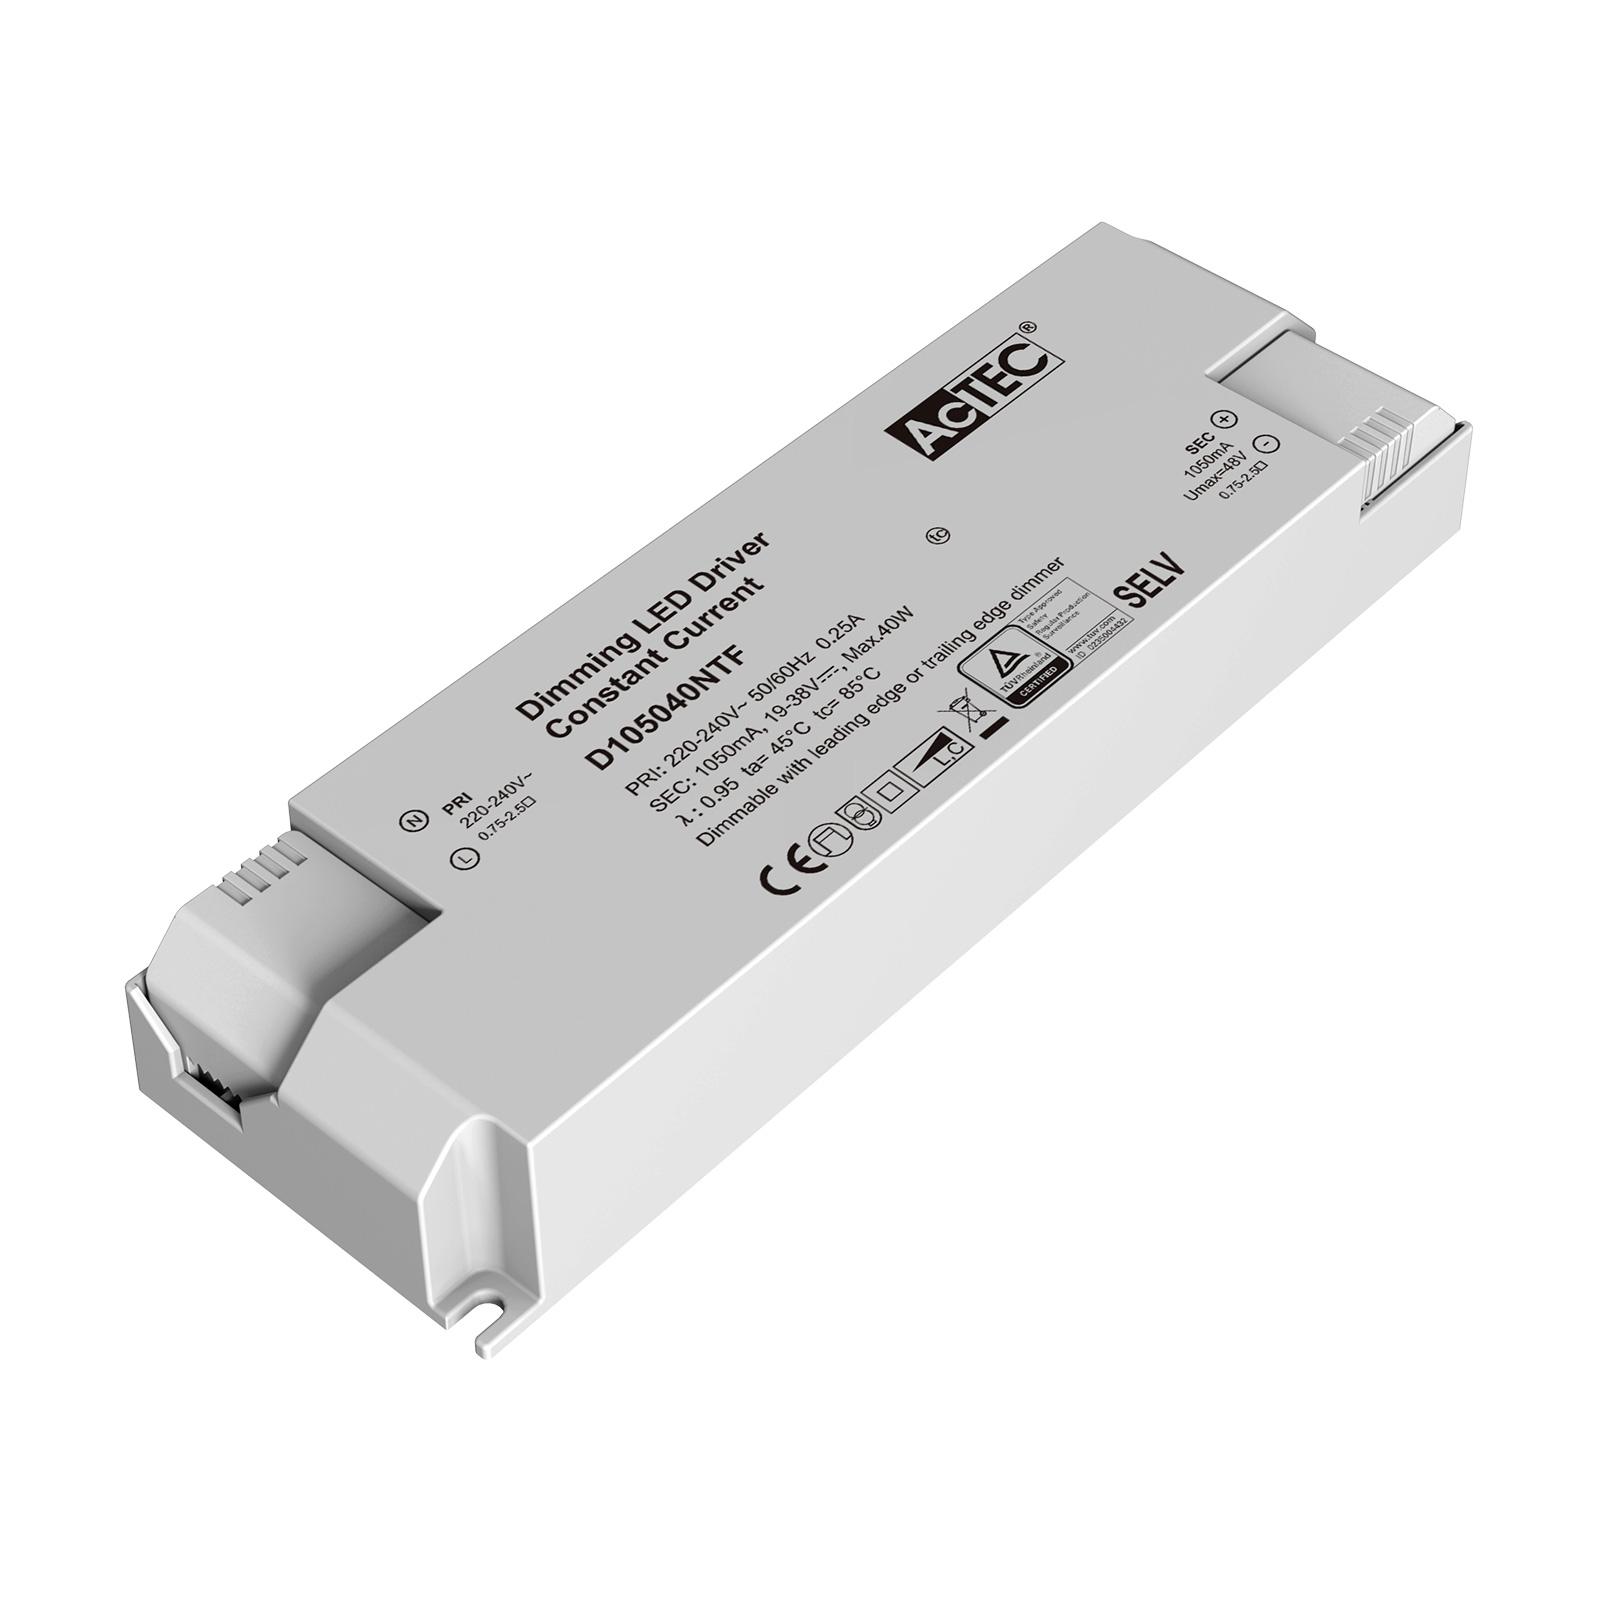 AcTEC Triac LED-Treiber CC max. 40W 1.050mA